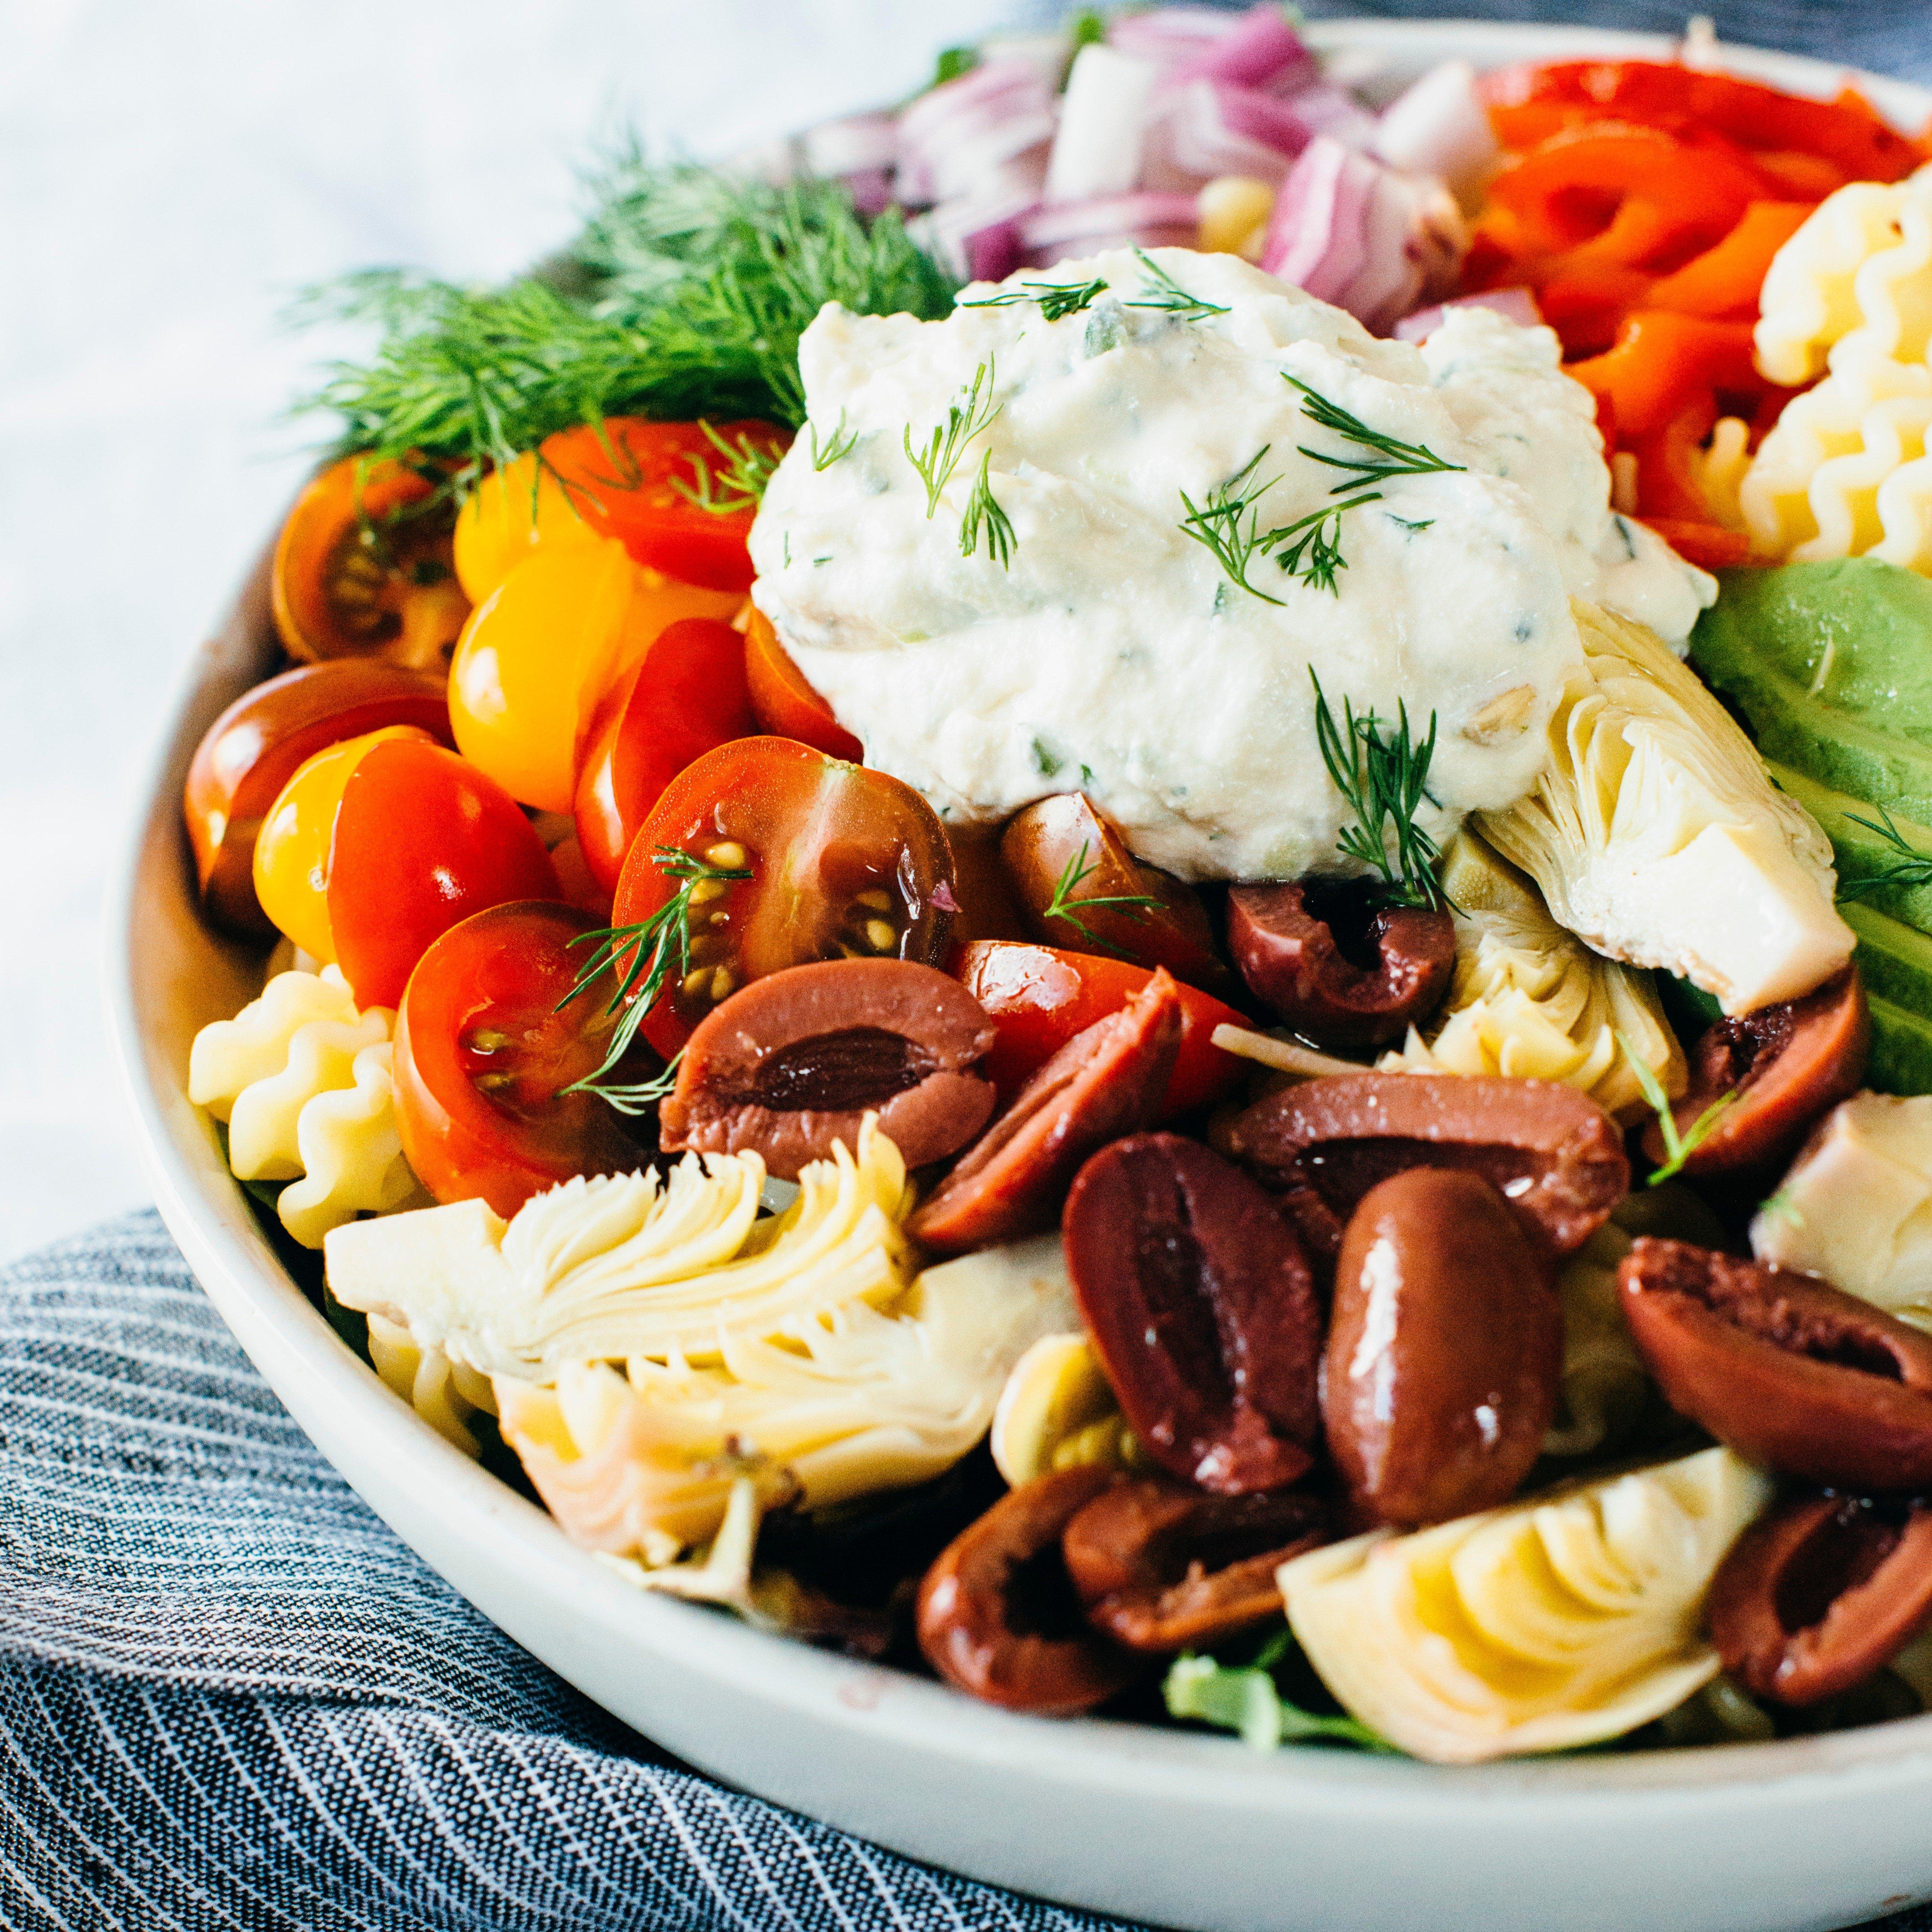 Creamy Vegan Pasta Salad